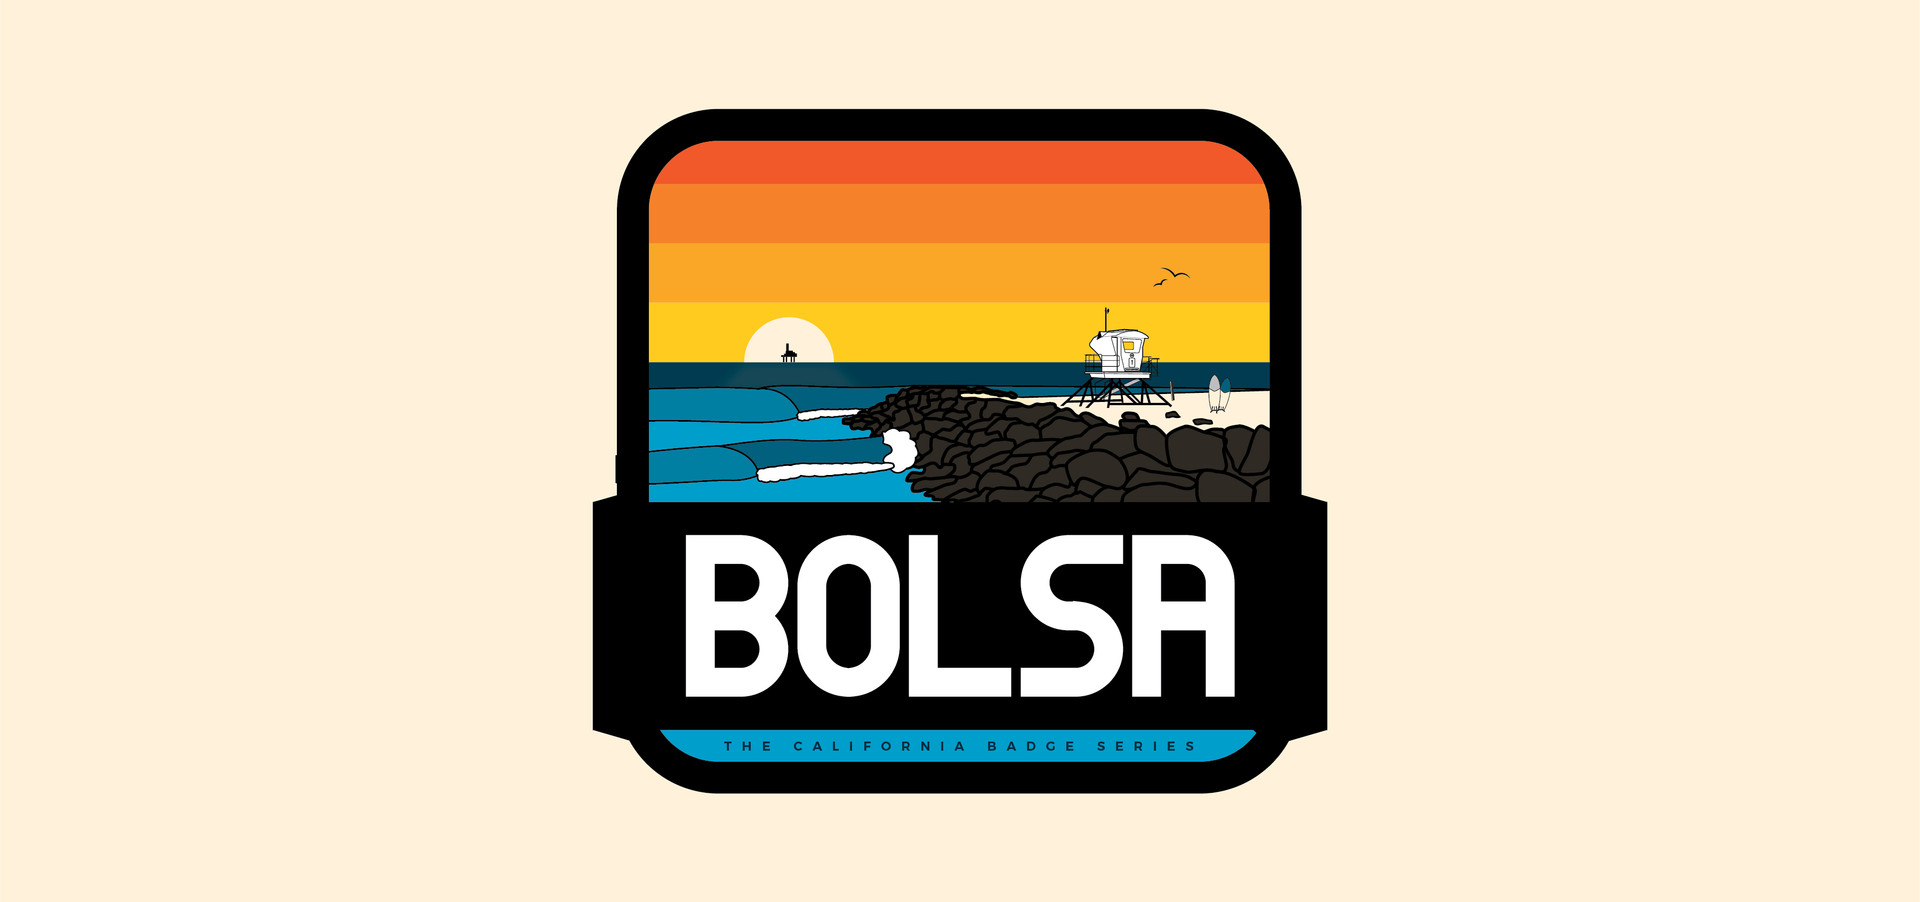 BOLSA-11.jpg